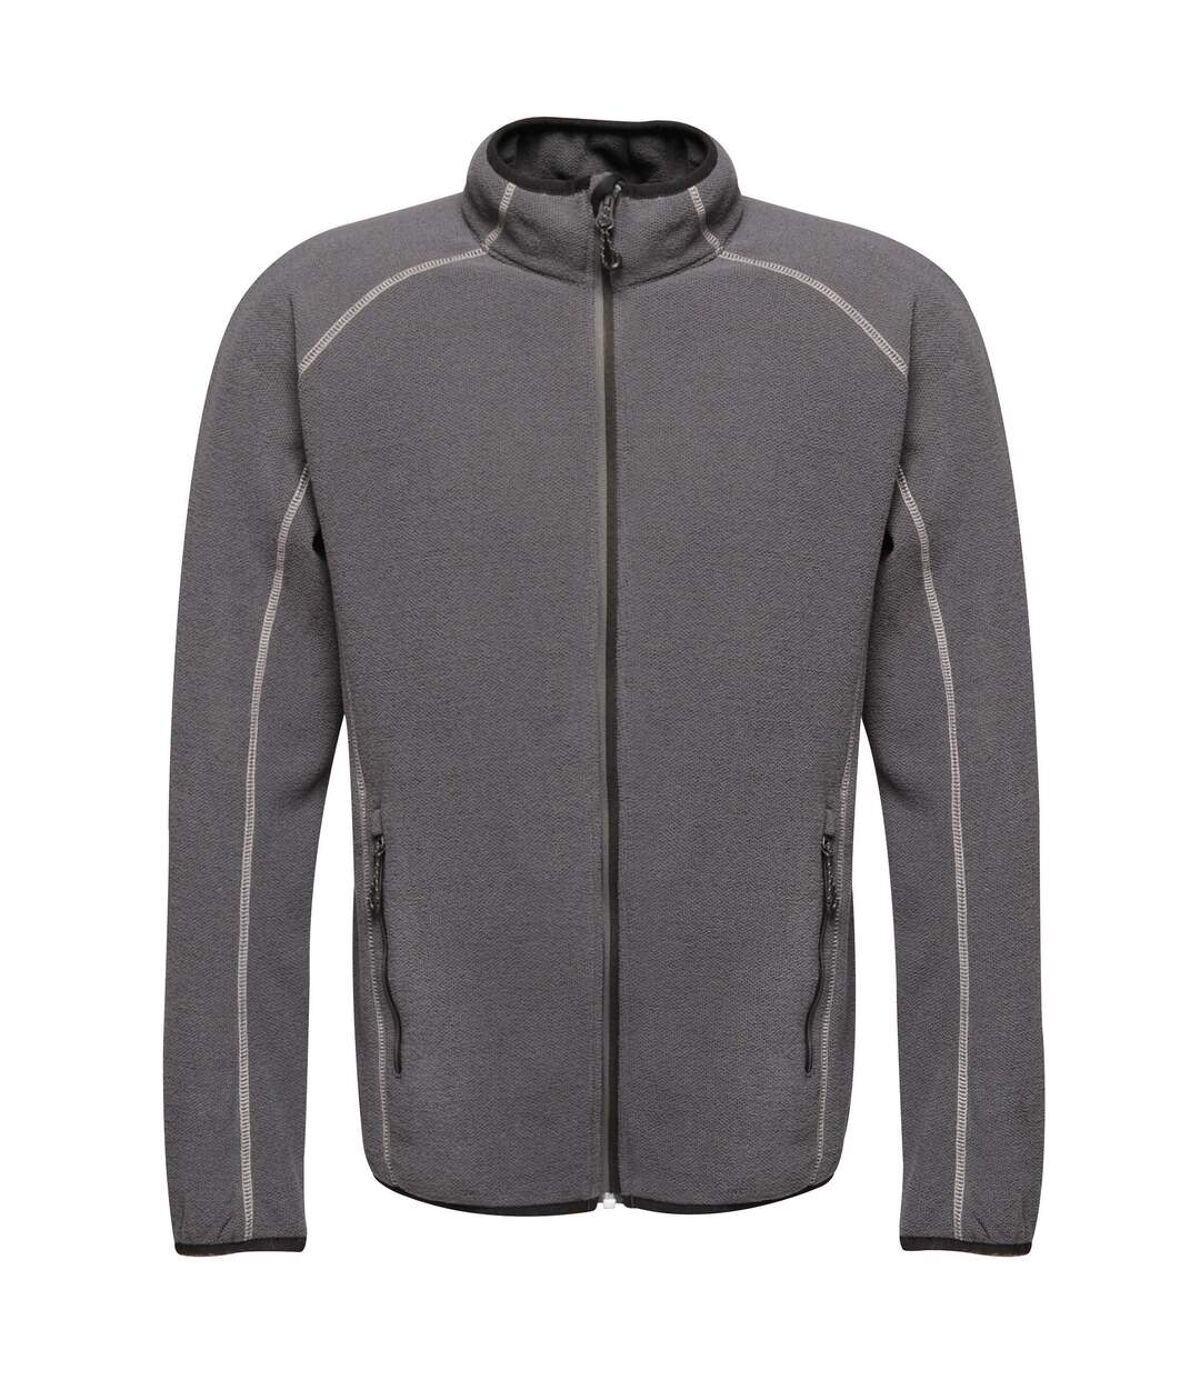 Regatta Mens Dreamste Full Zip Mini Honeycomb Fleece (Seal Grey) - UTRG4158